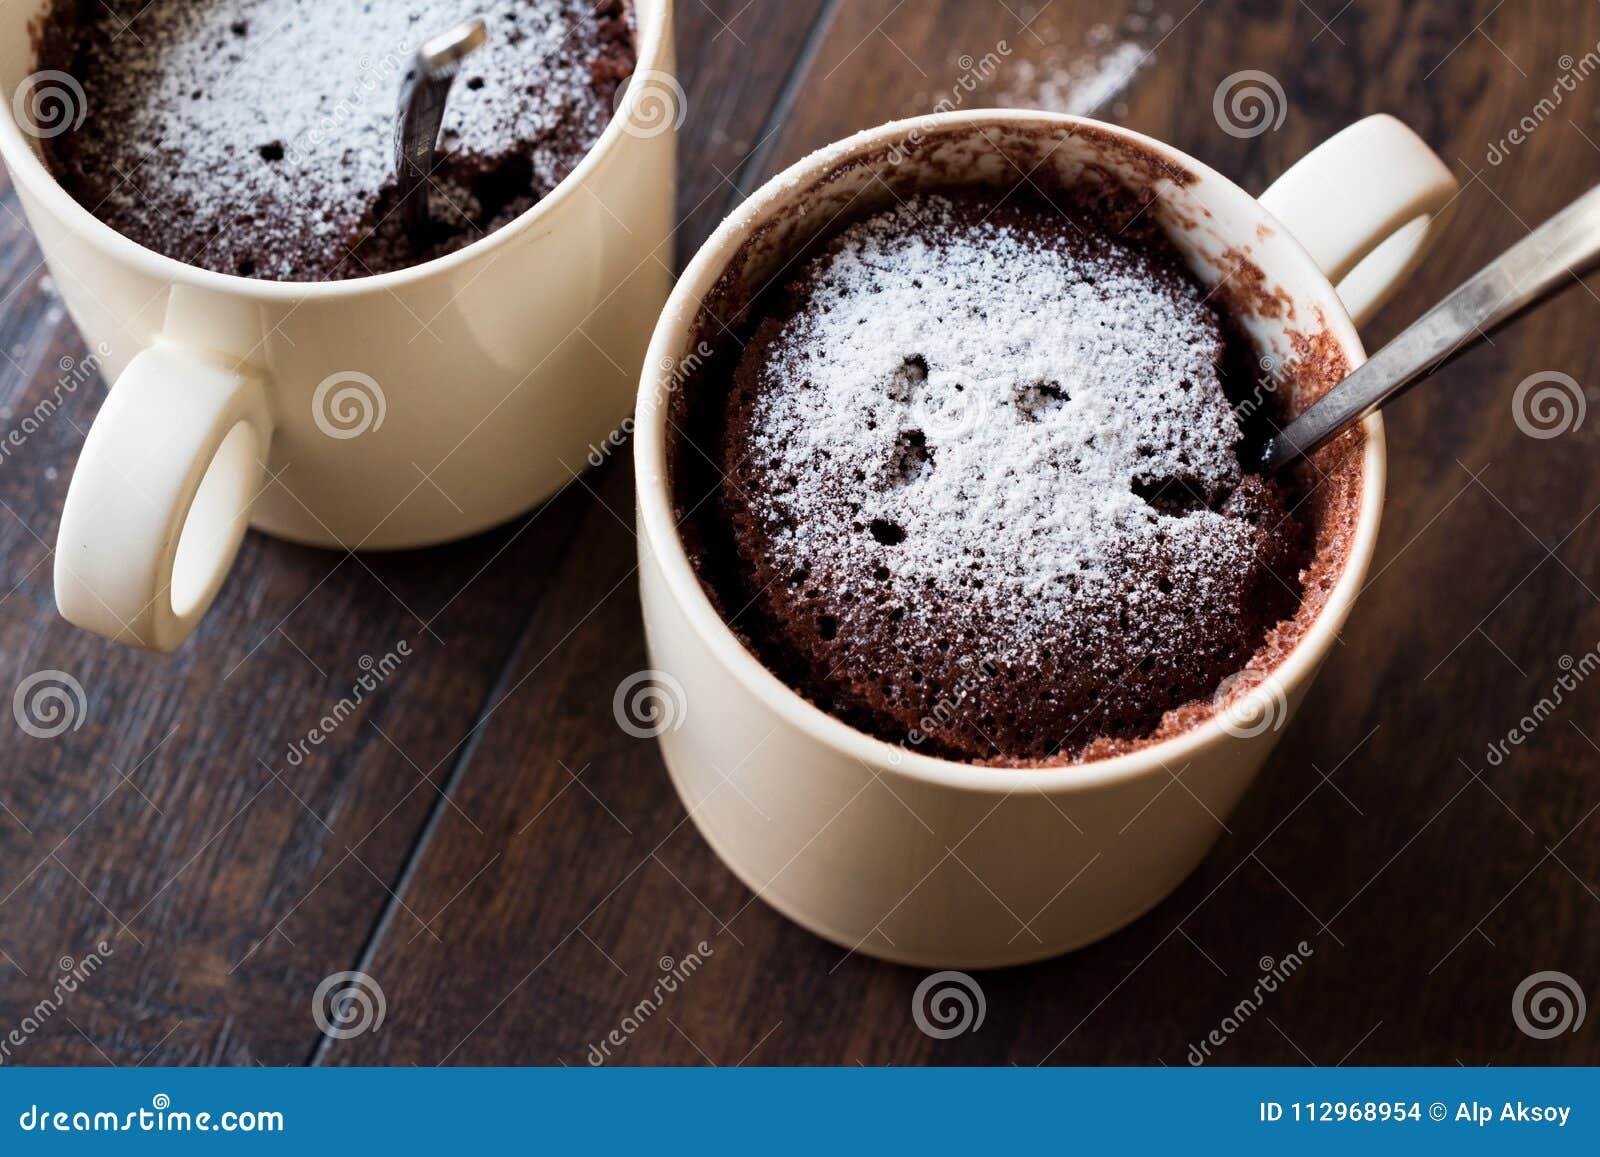 Microwave Brownie Chocolate Mug Cake With Powder Sugar On Dark Wooden Surface Stock Photo Image Of Snack Bakery 112968954